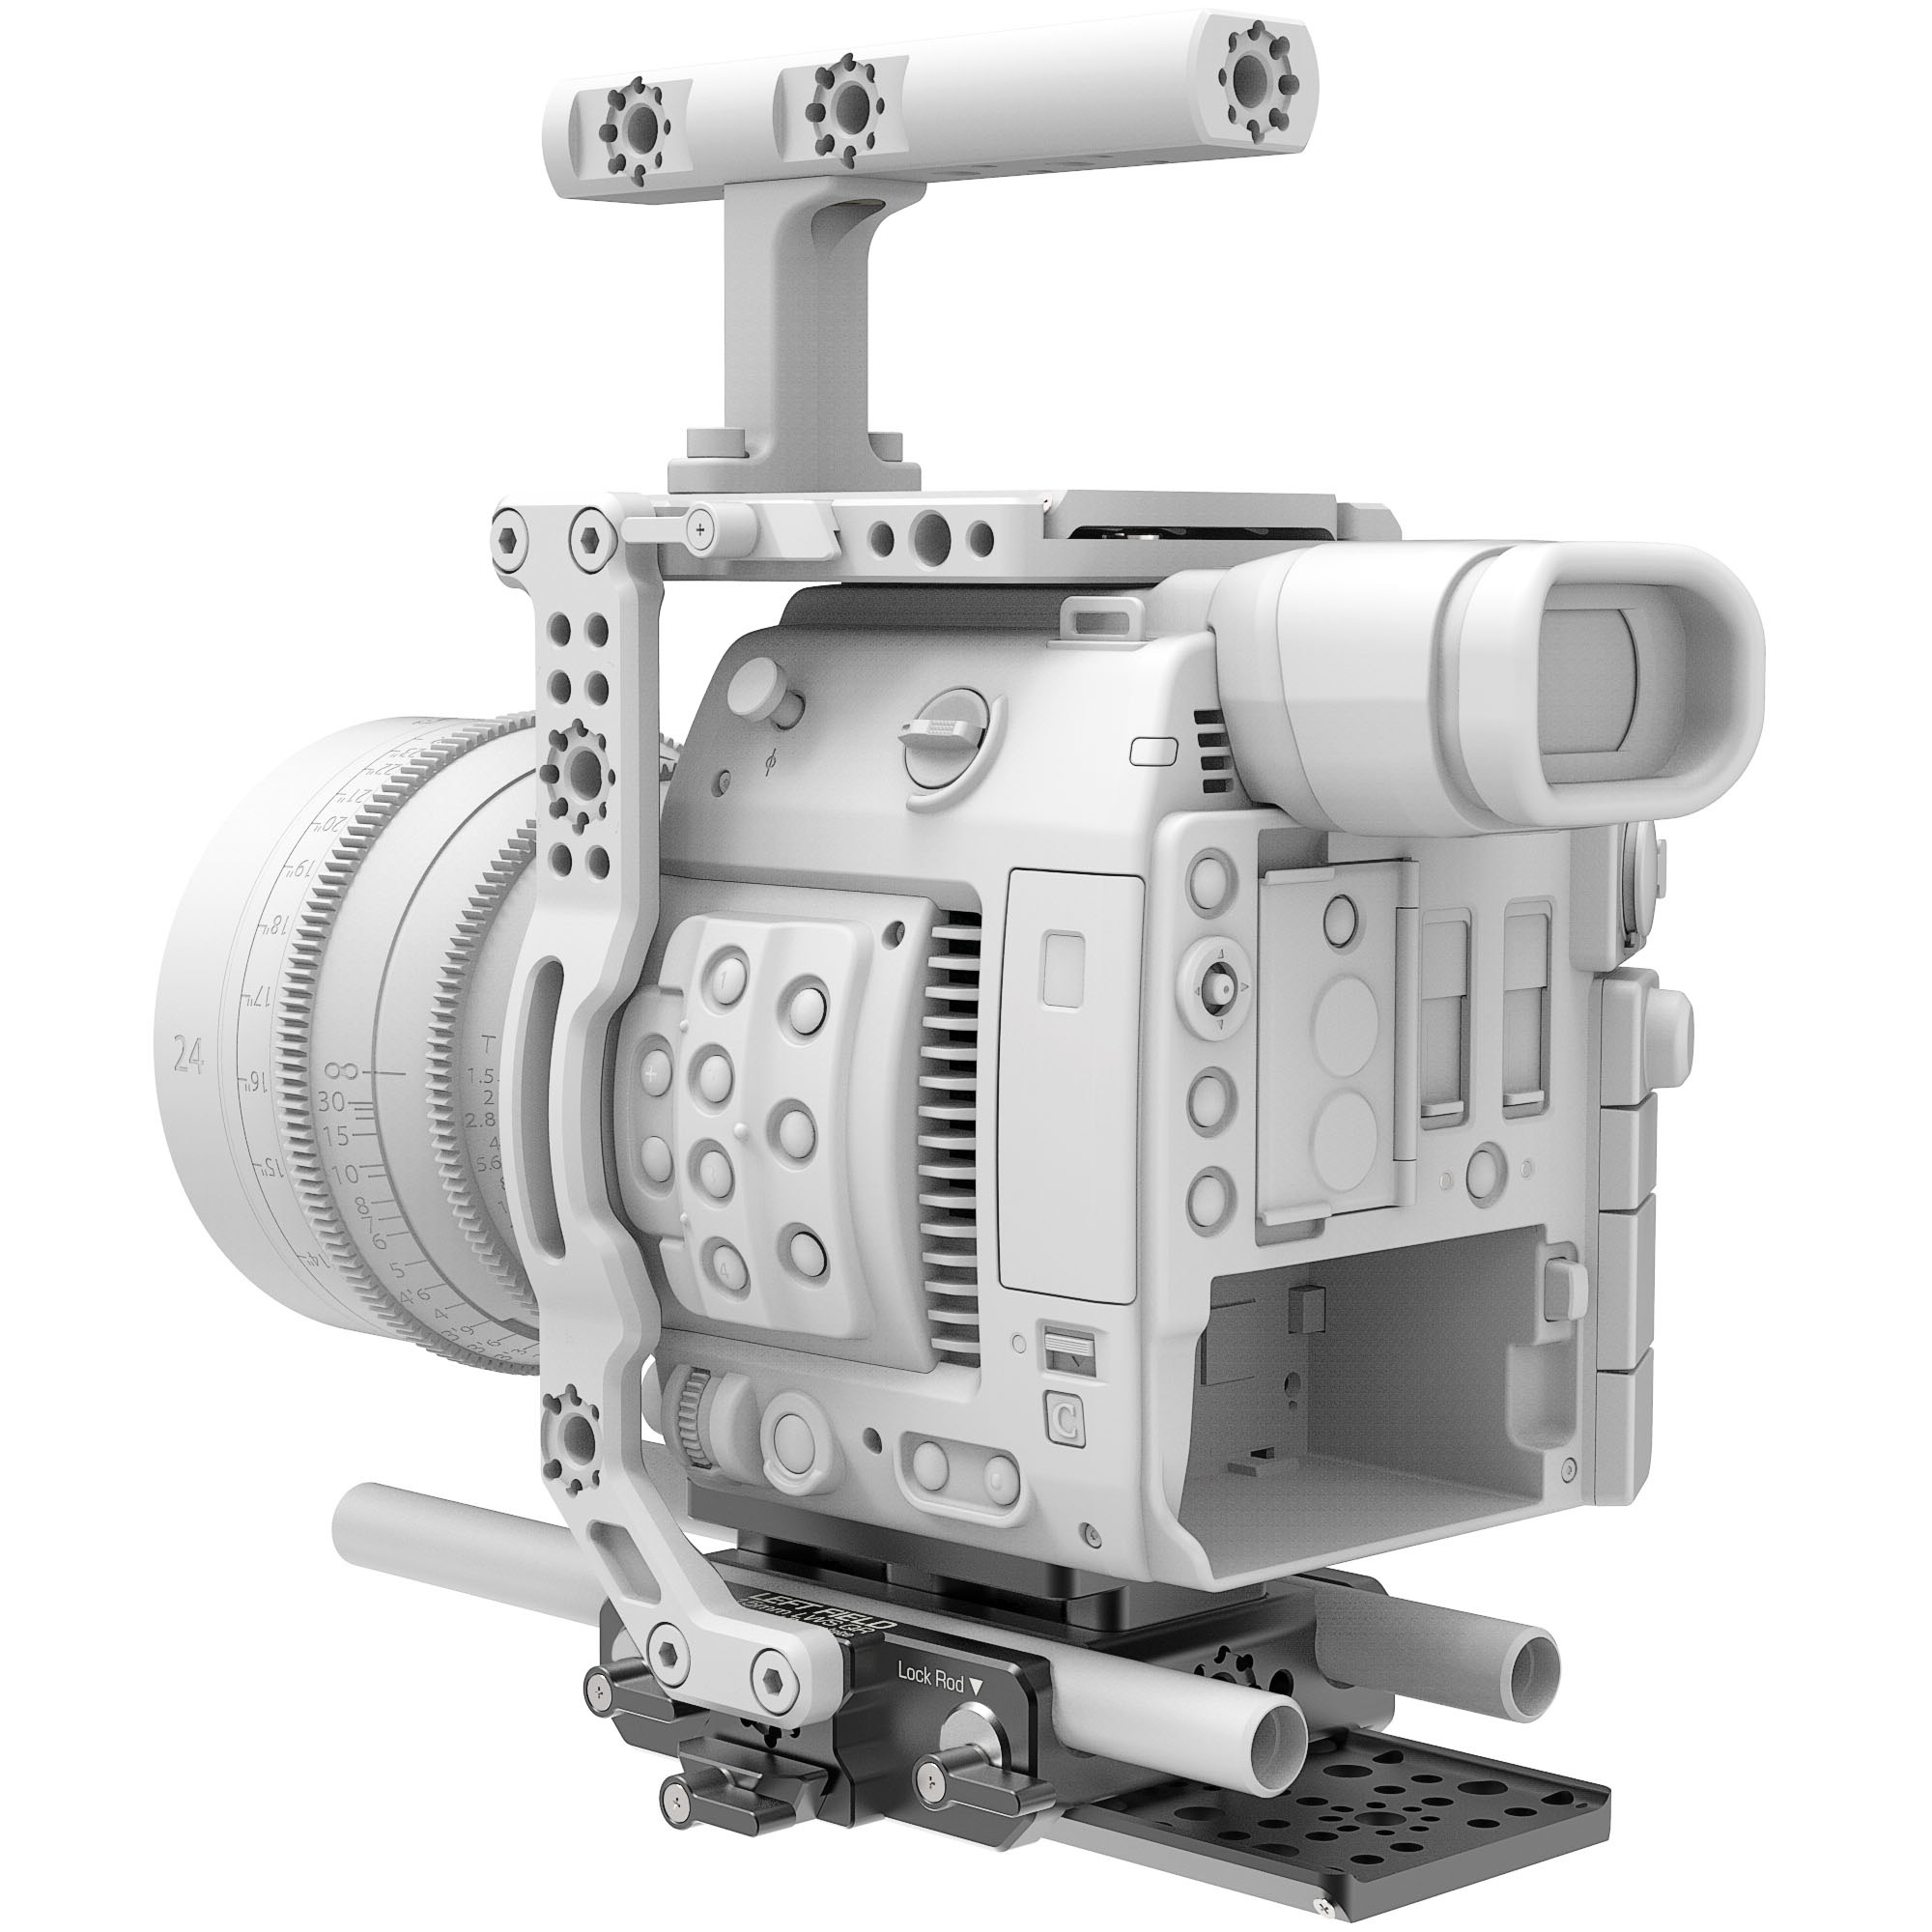 B4005.0001 Canon C200 LWS sliding Baseplate 12